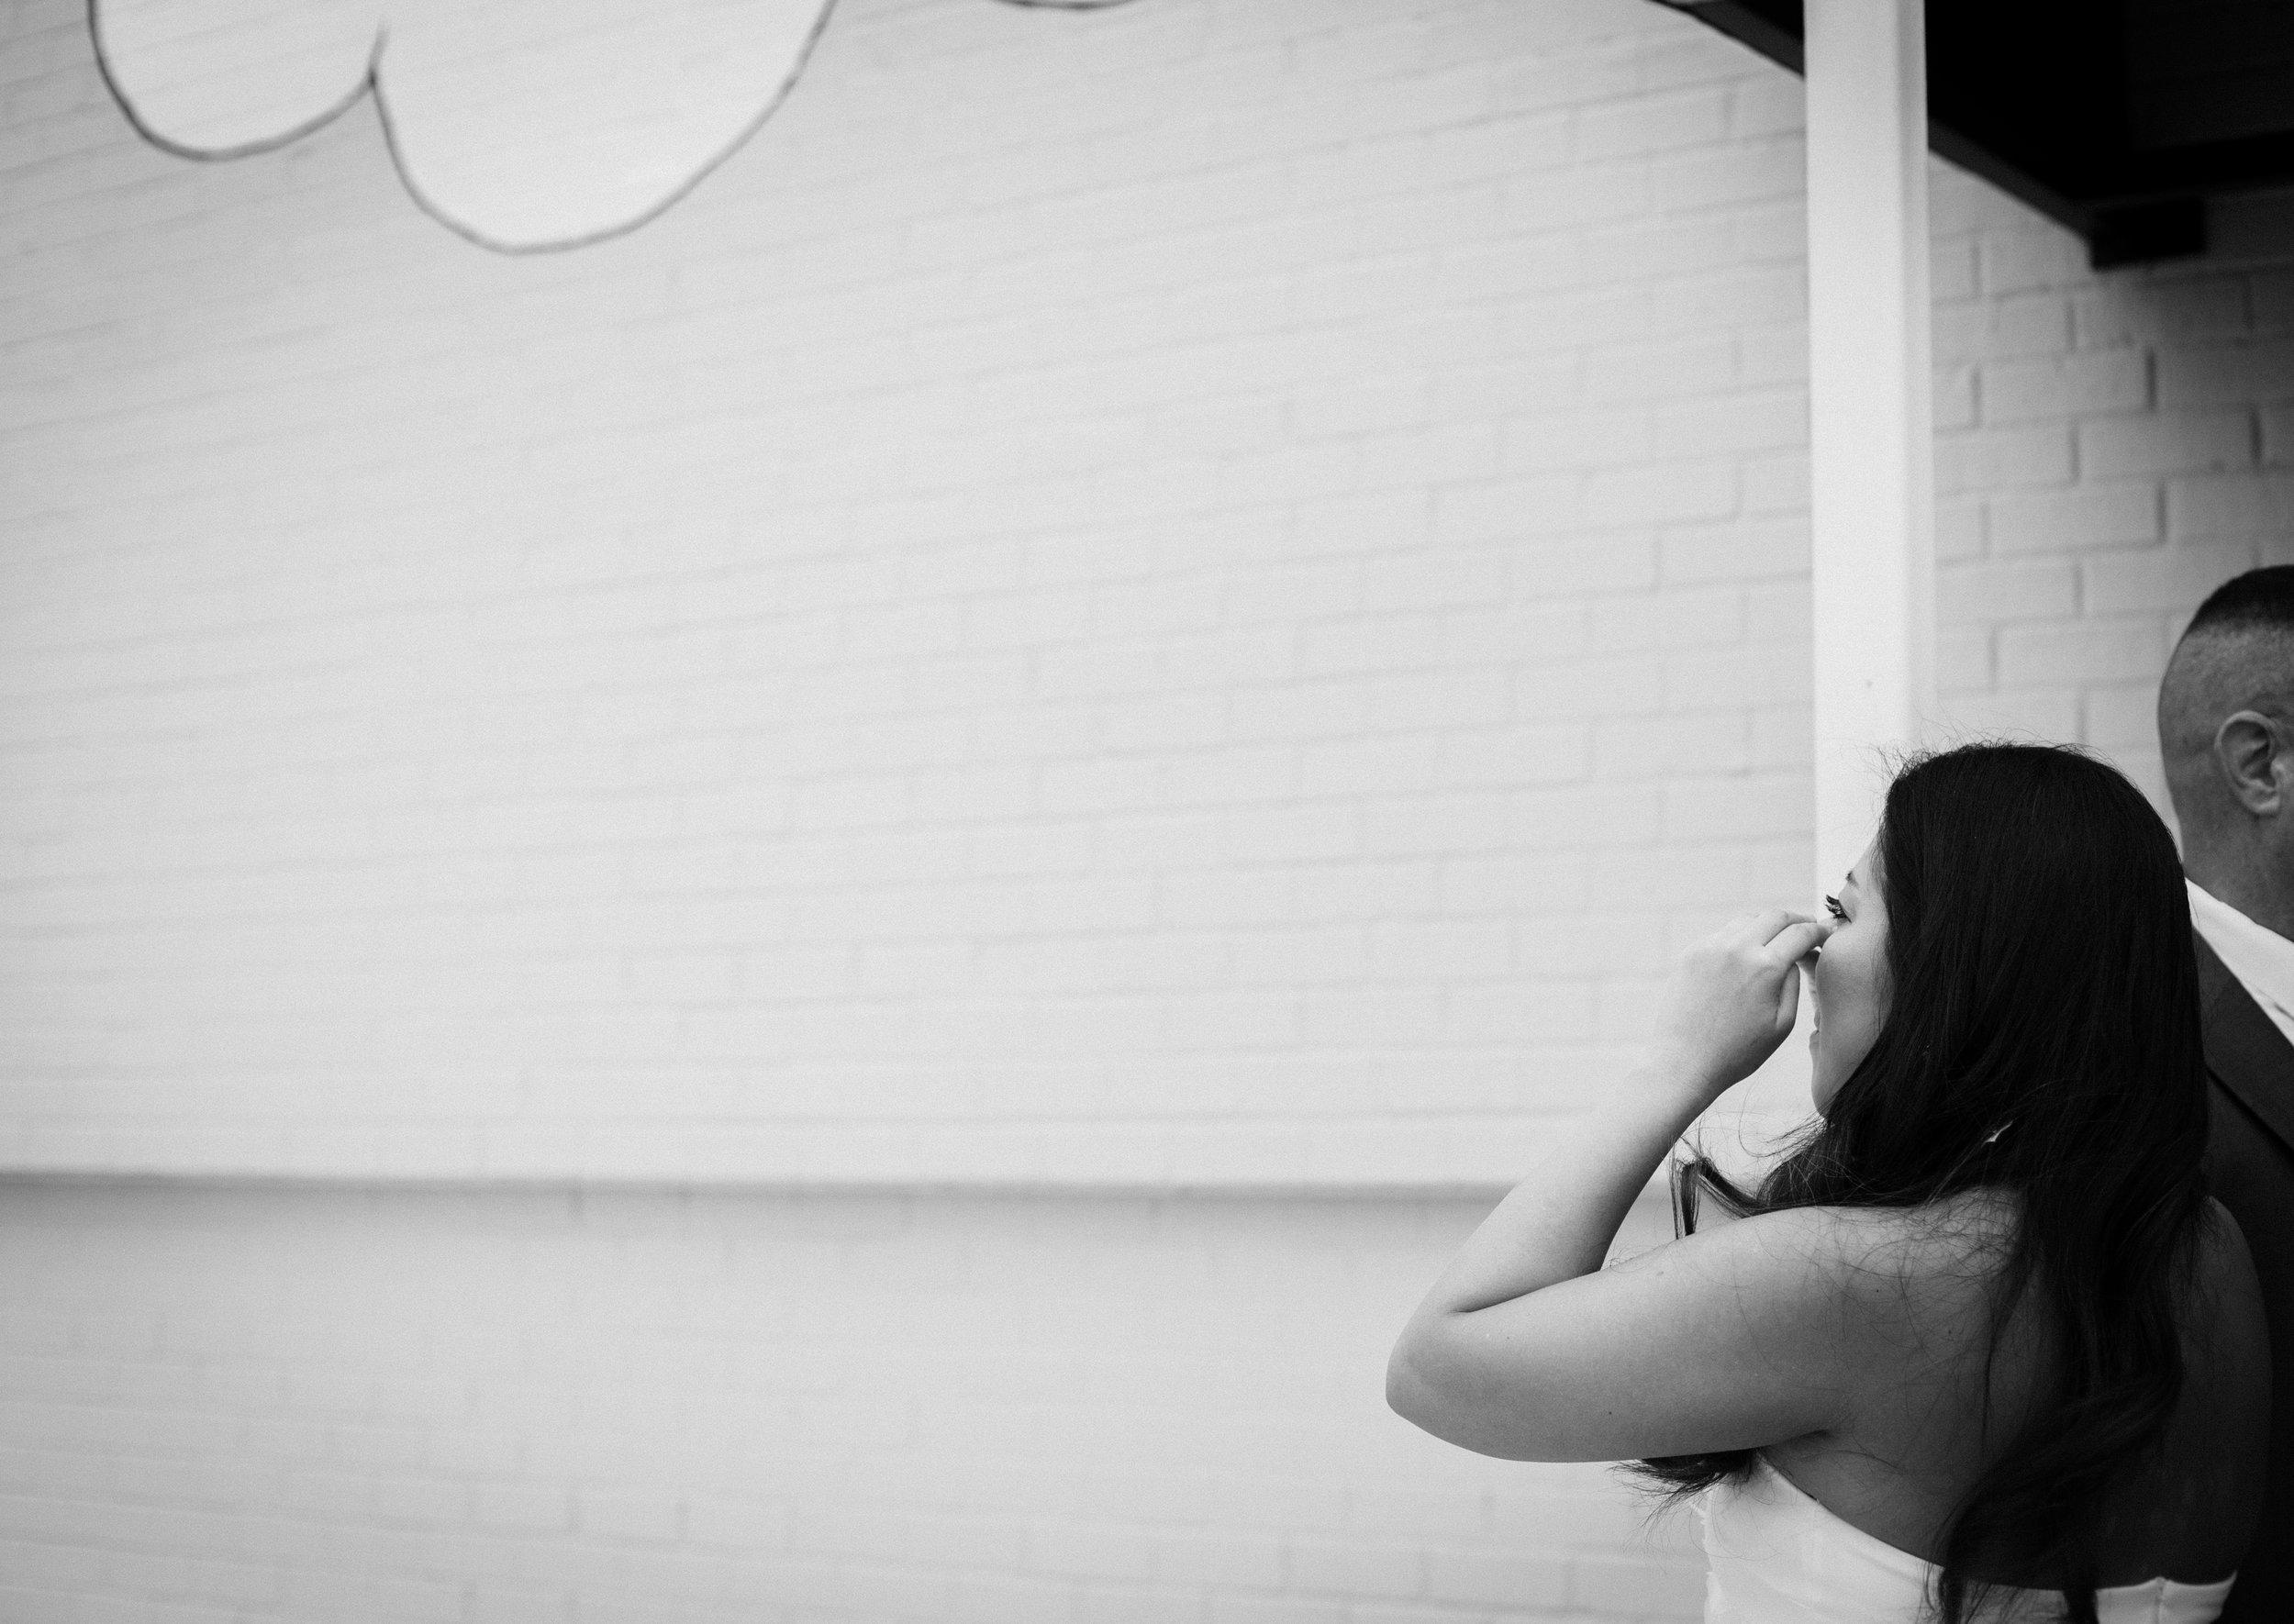 rebeccaburtphotography.LydiaKoh.RobertSallire.Richmond.TheGraduate.Elopement-62.JPG